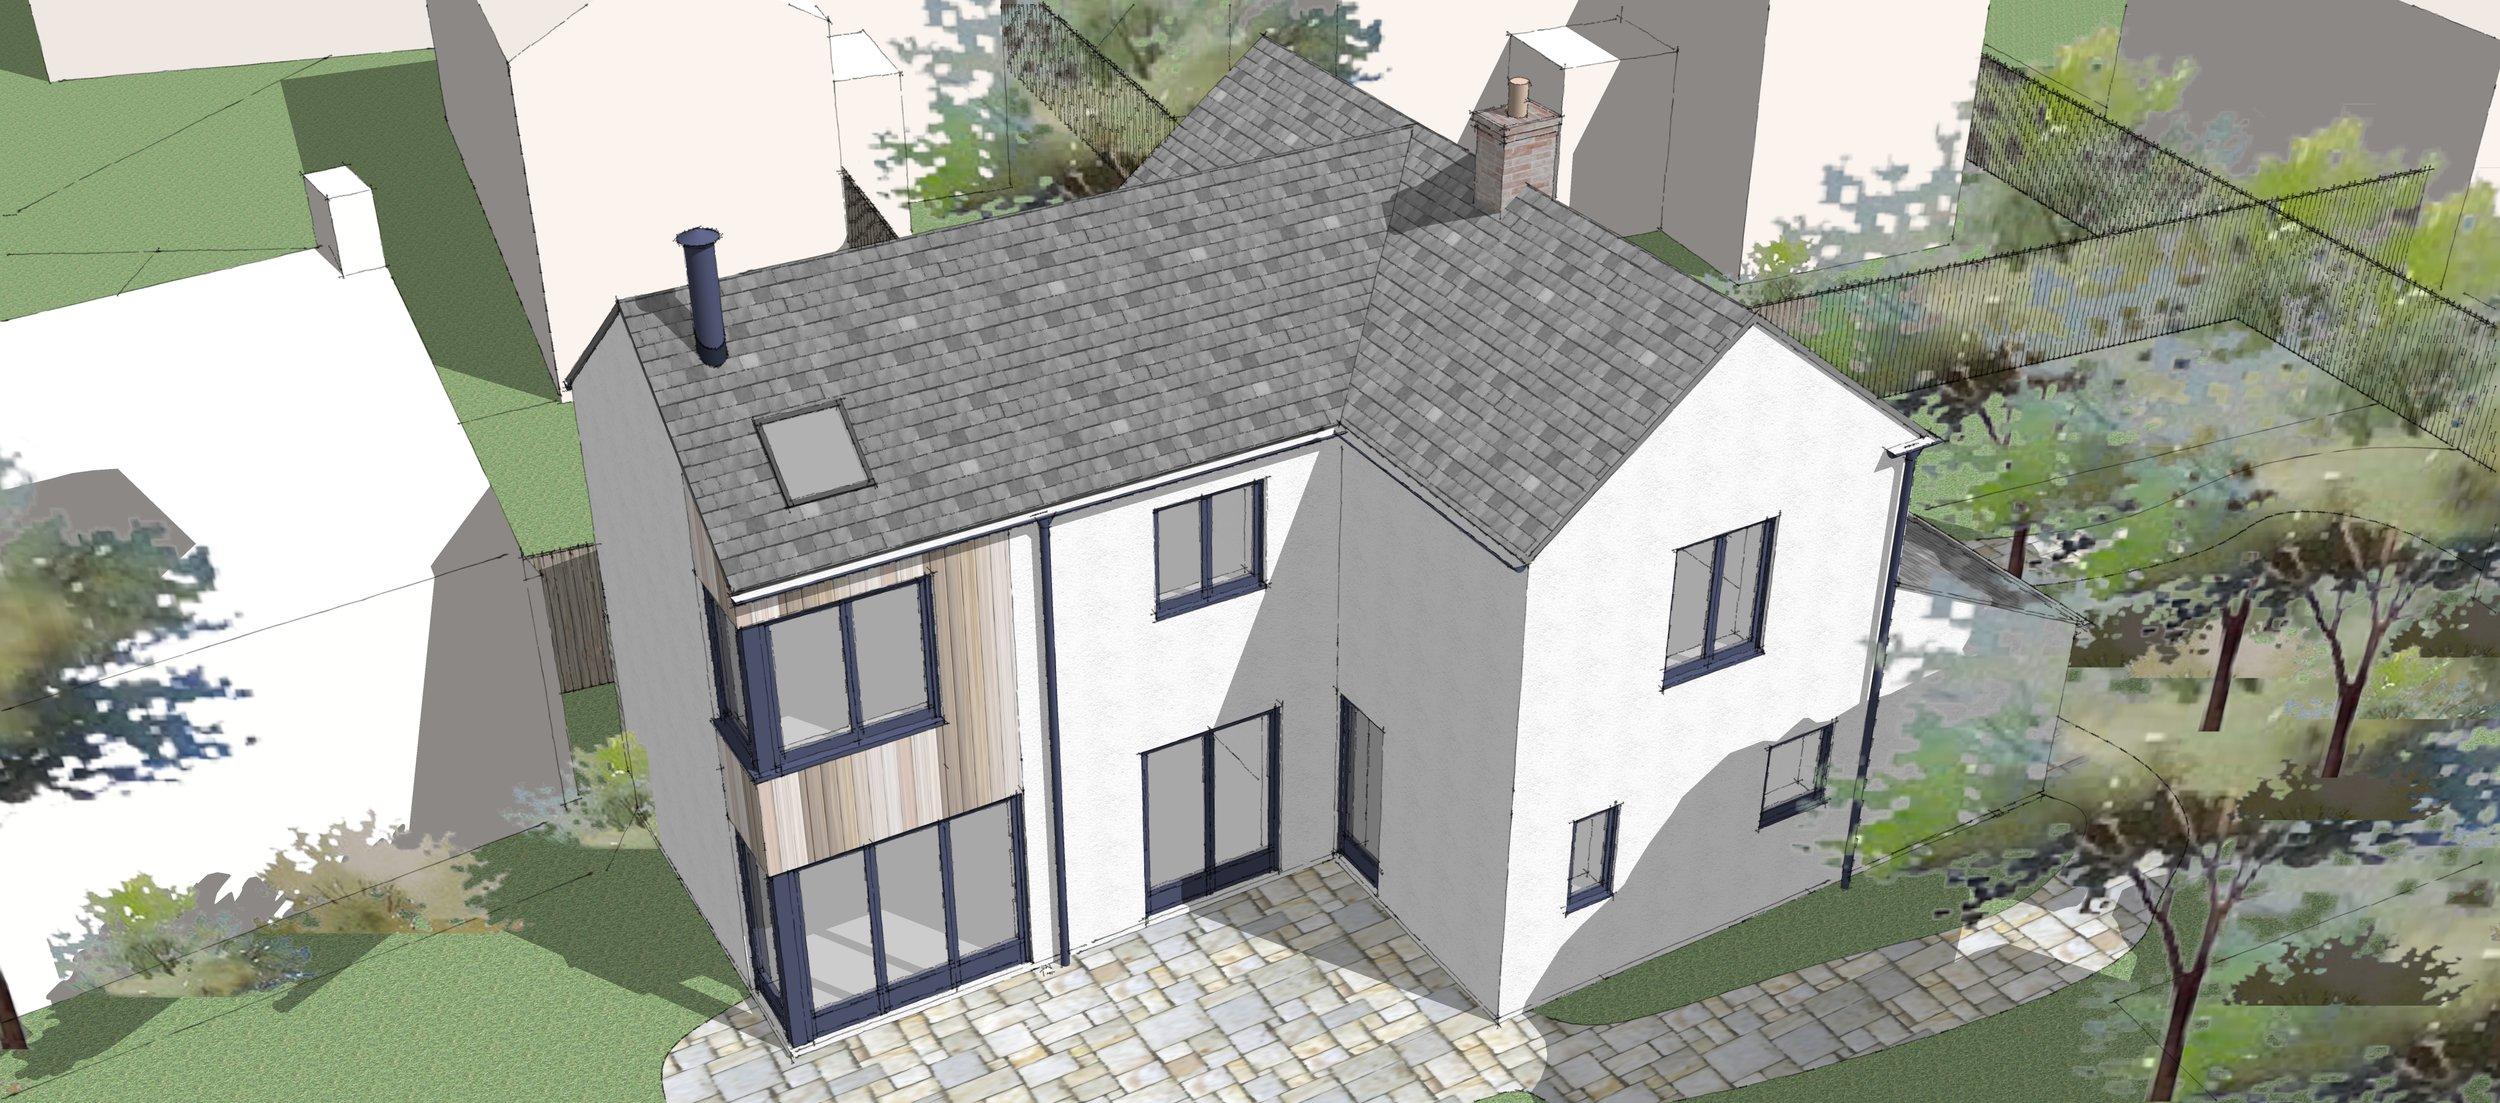 House Remodelling, Heage, Derbyshire